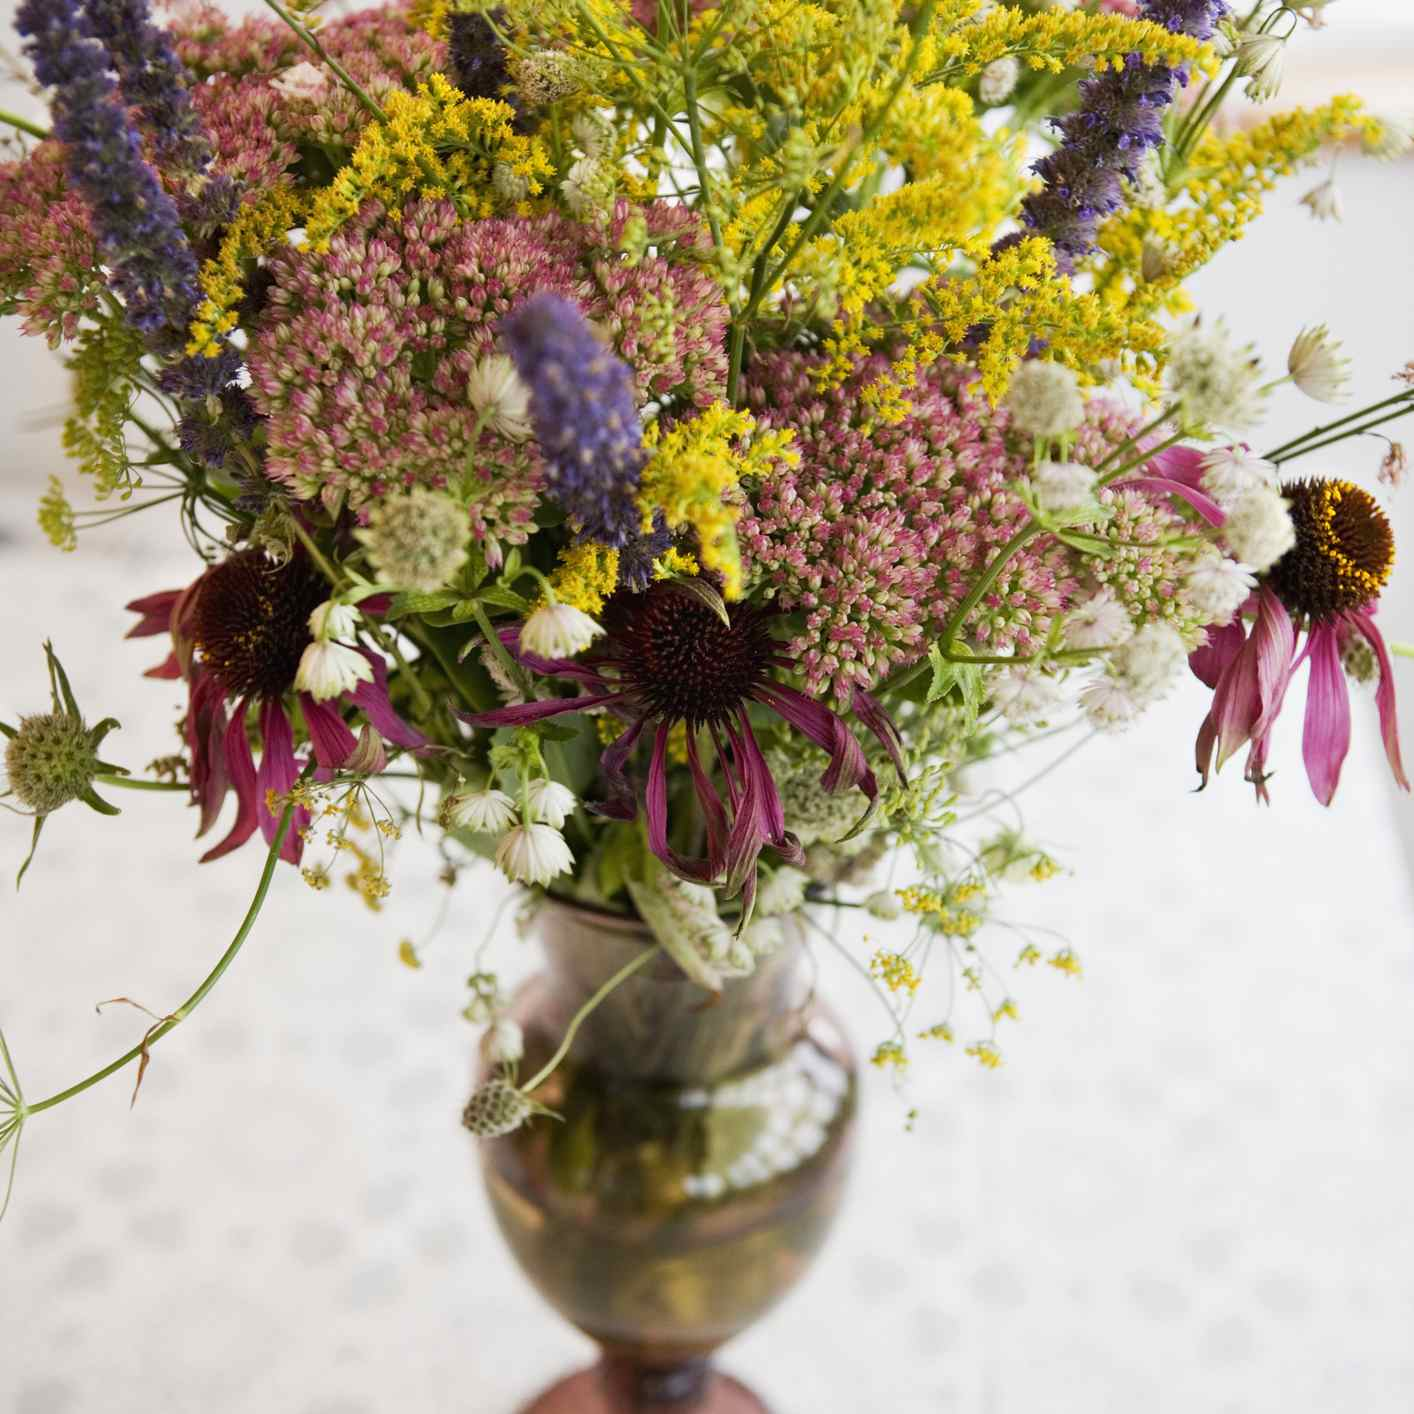 Goldenrod, sedum, and coneflowers in a vase